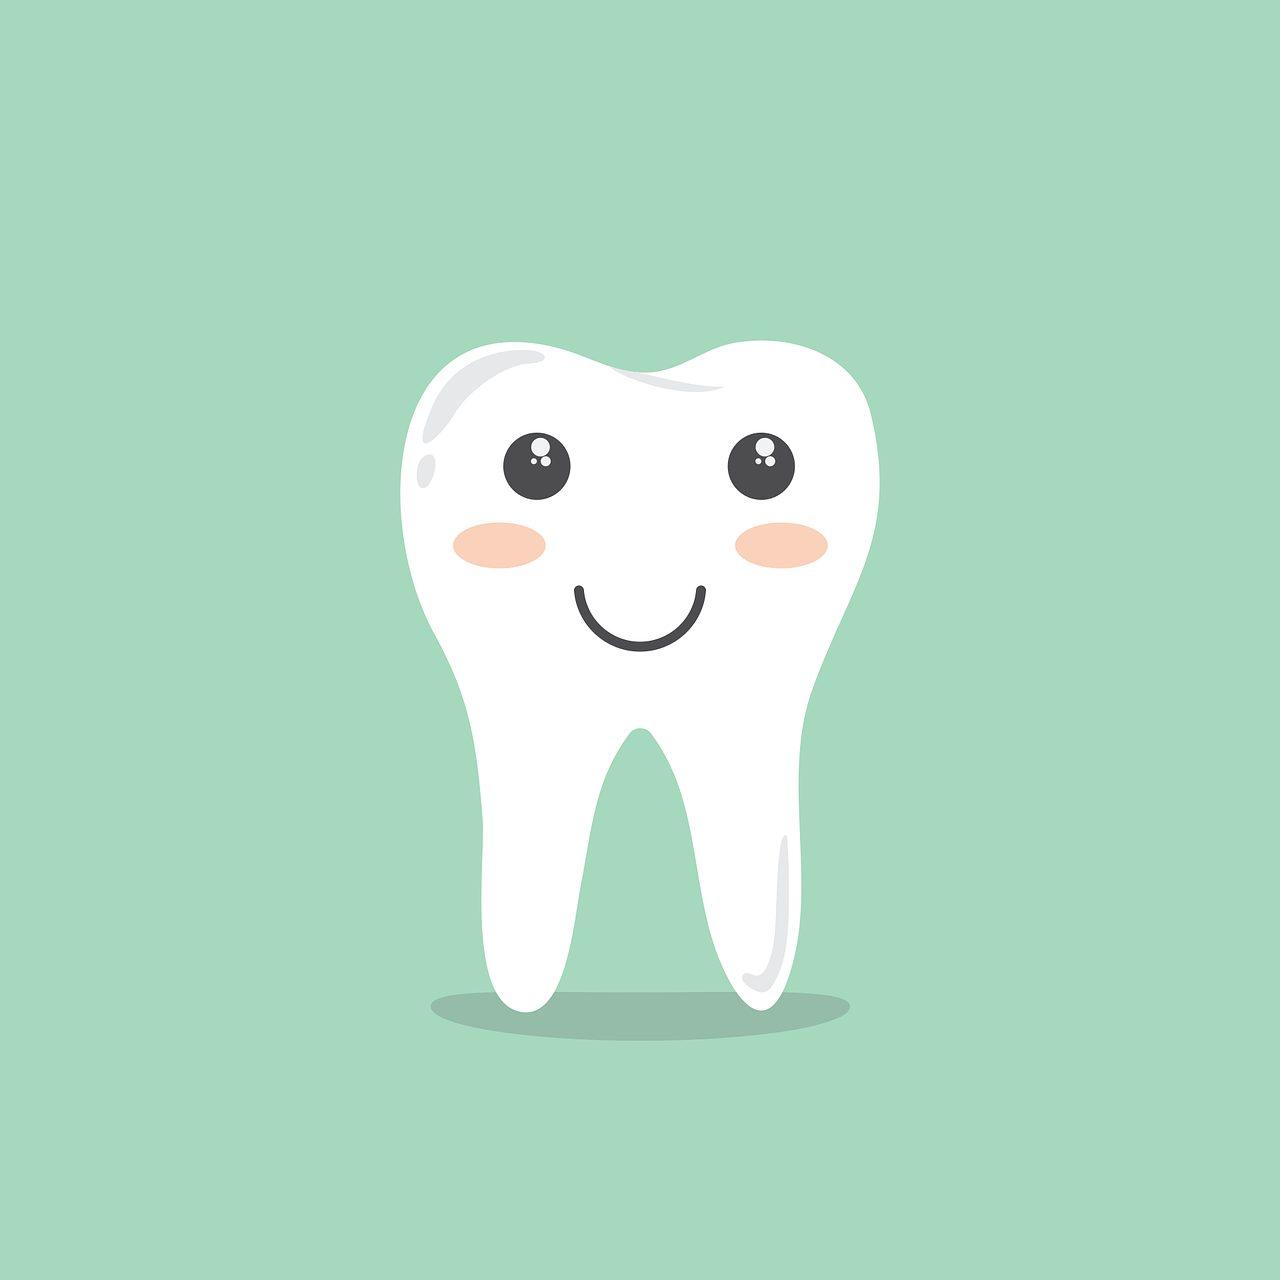 Akker C J G M vd tandartspraktijk